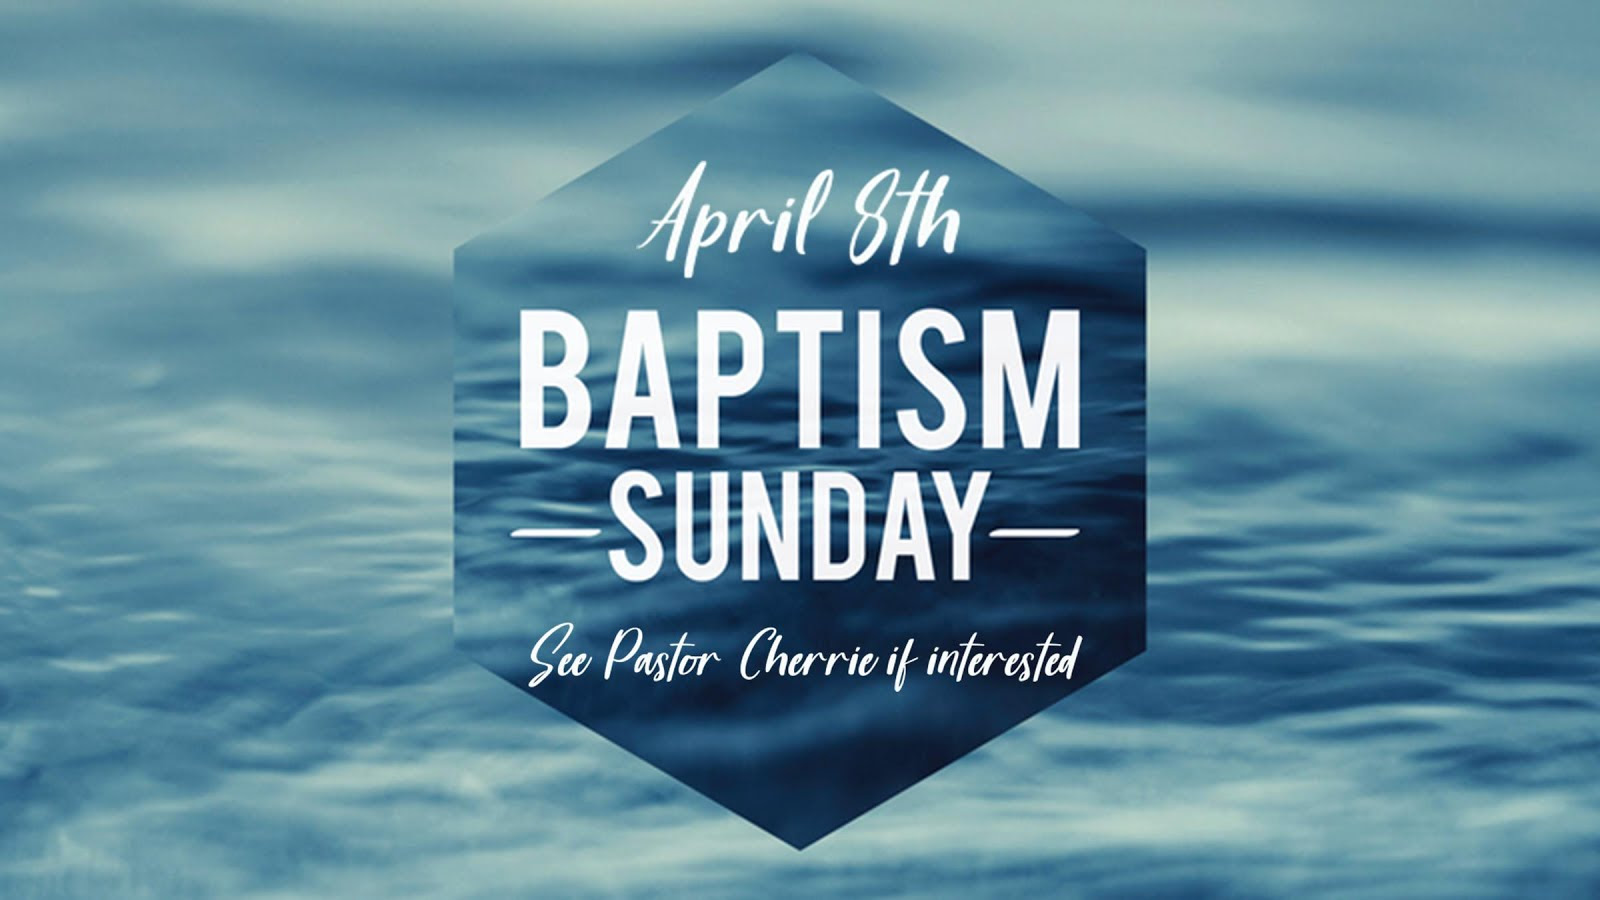 Baptism Sunday Christian Family Church